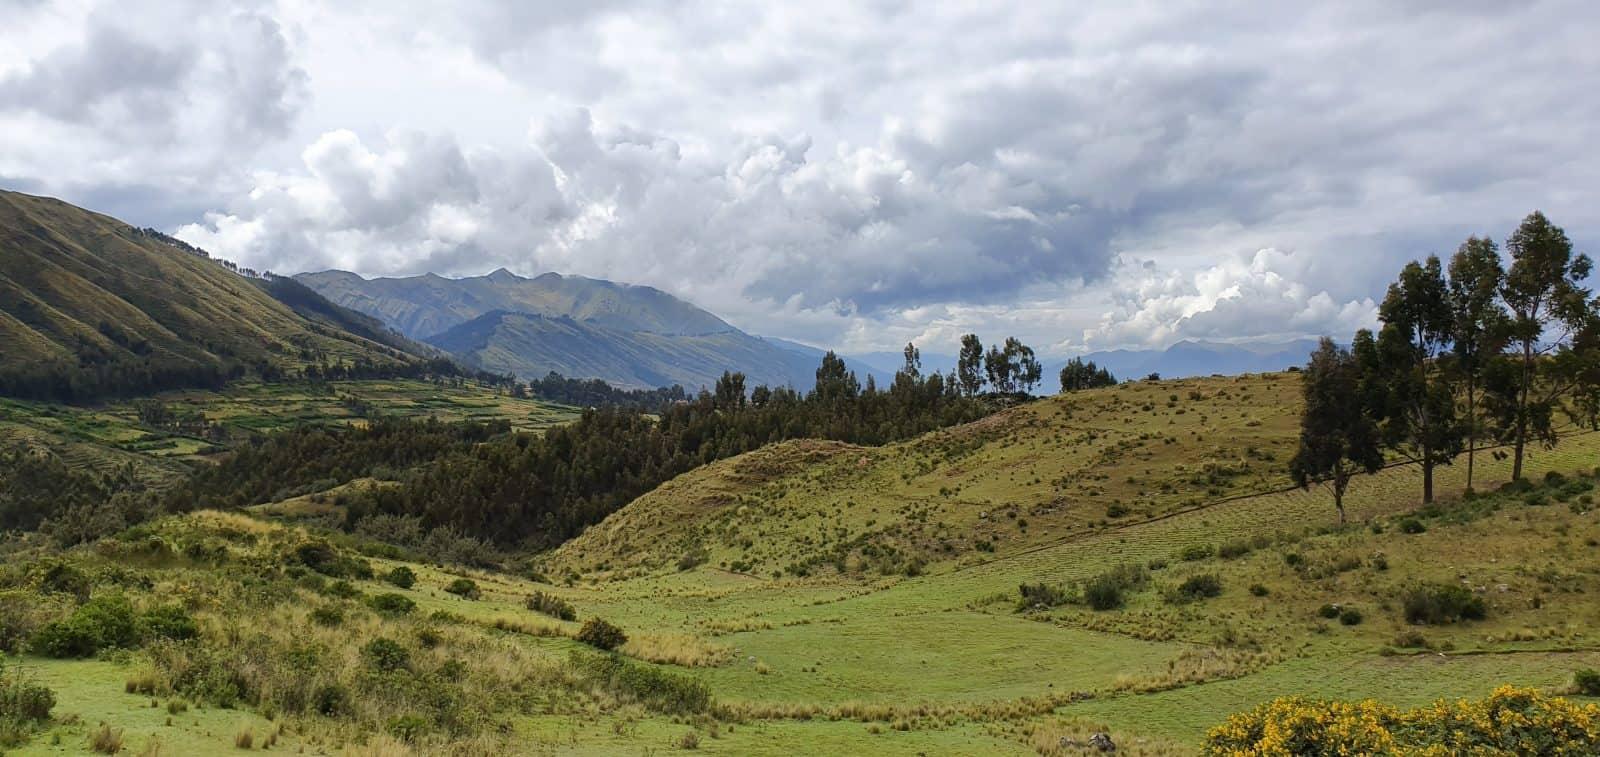 Photo of the view from Puka Pukara